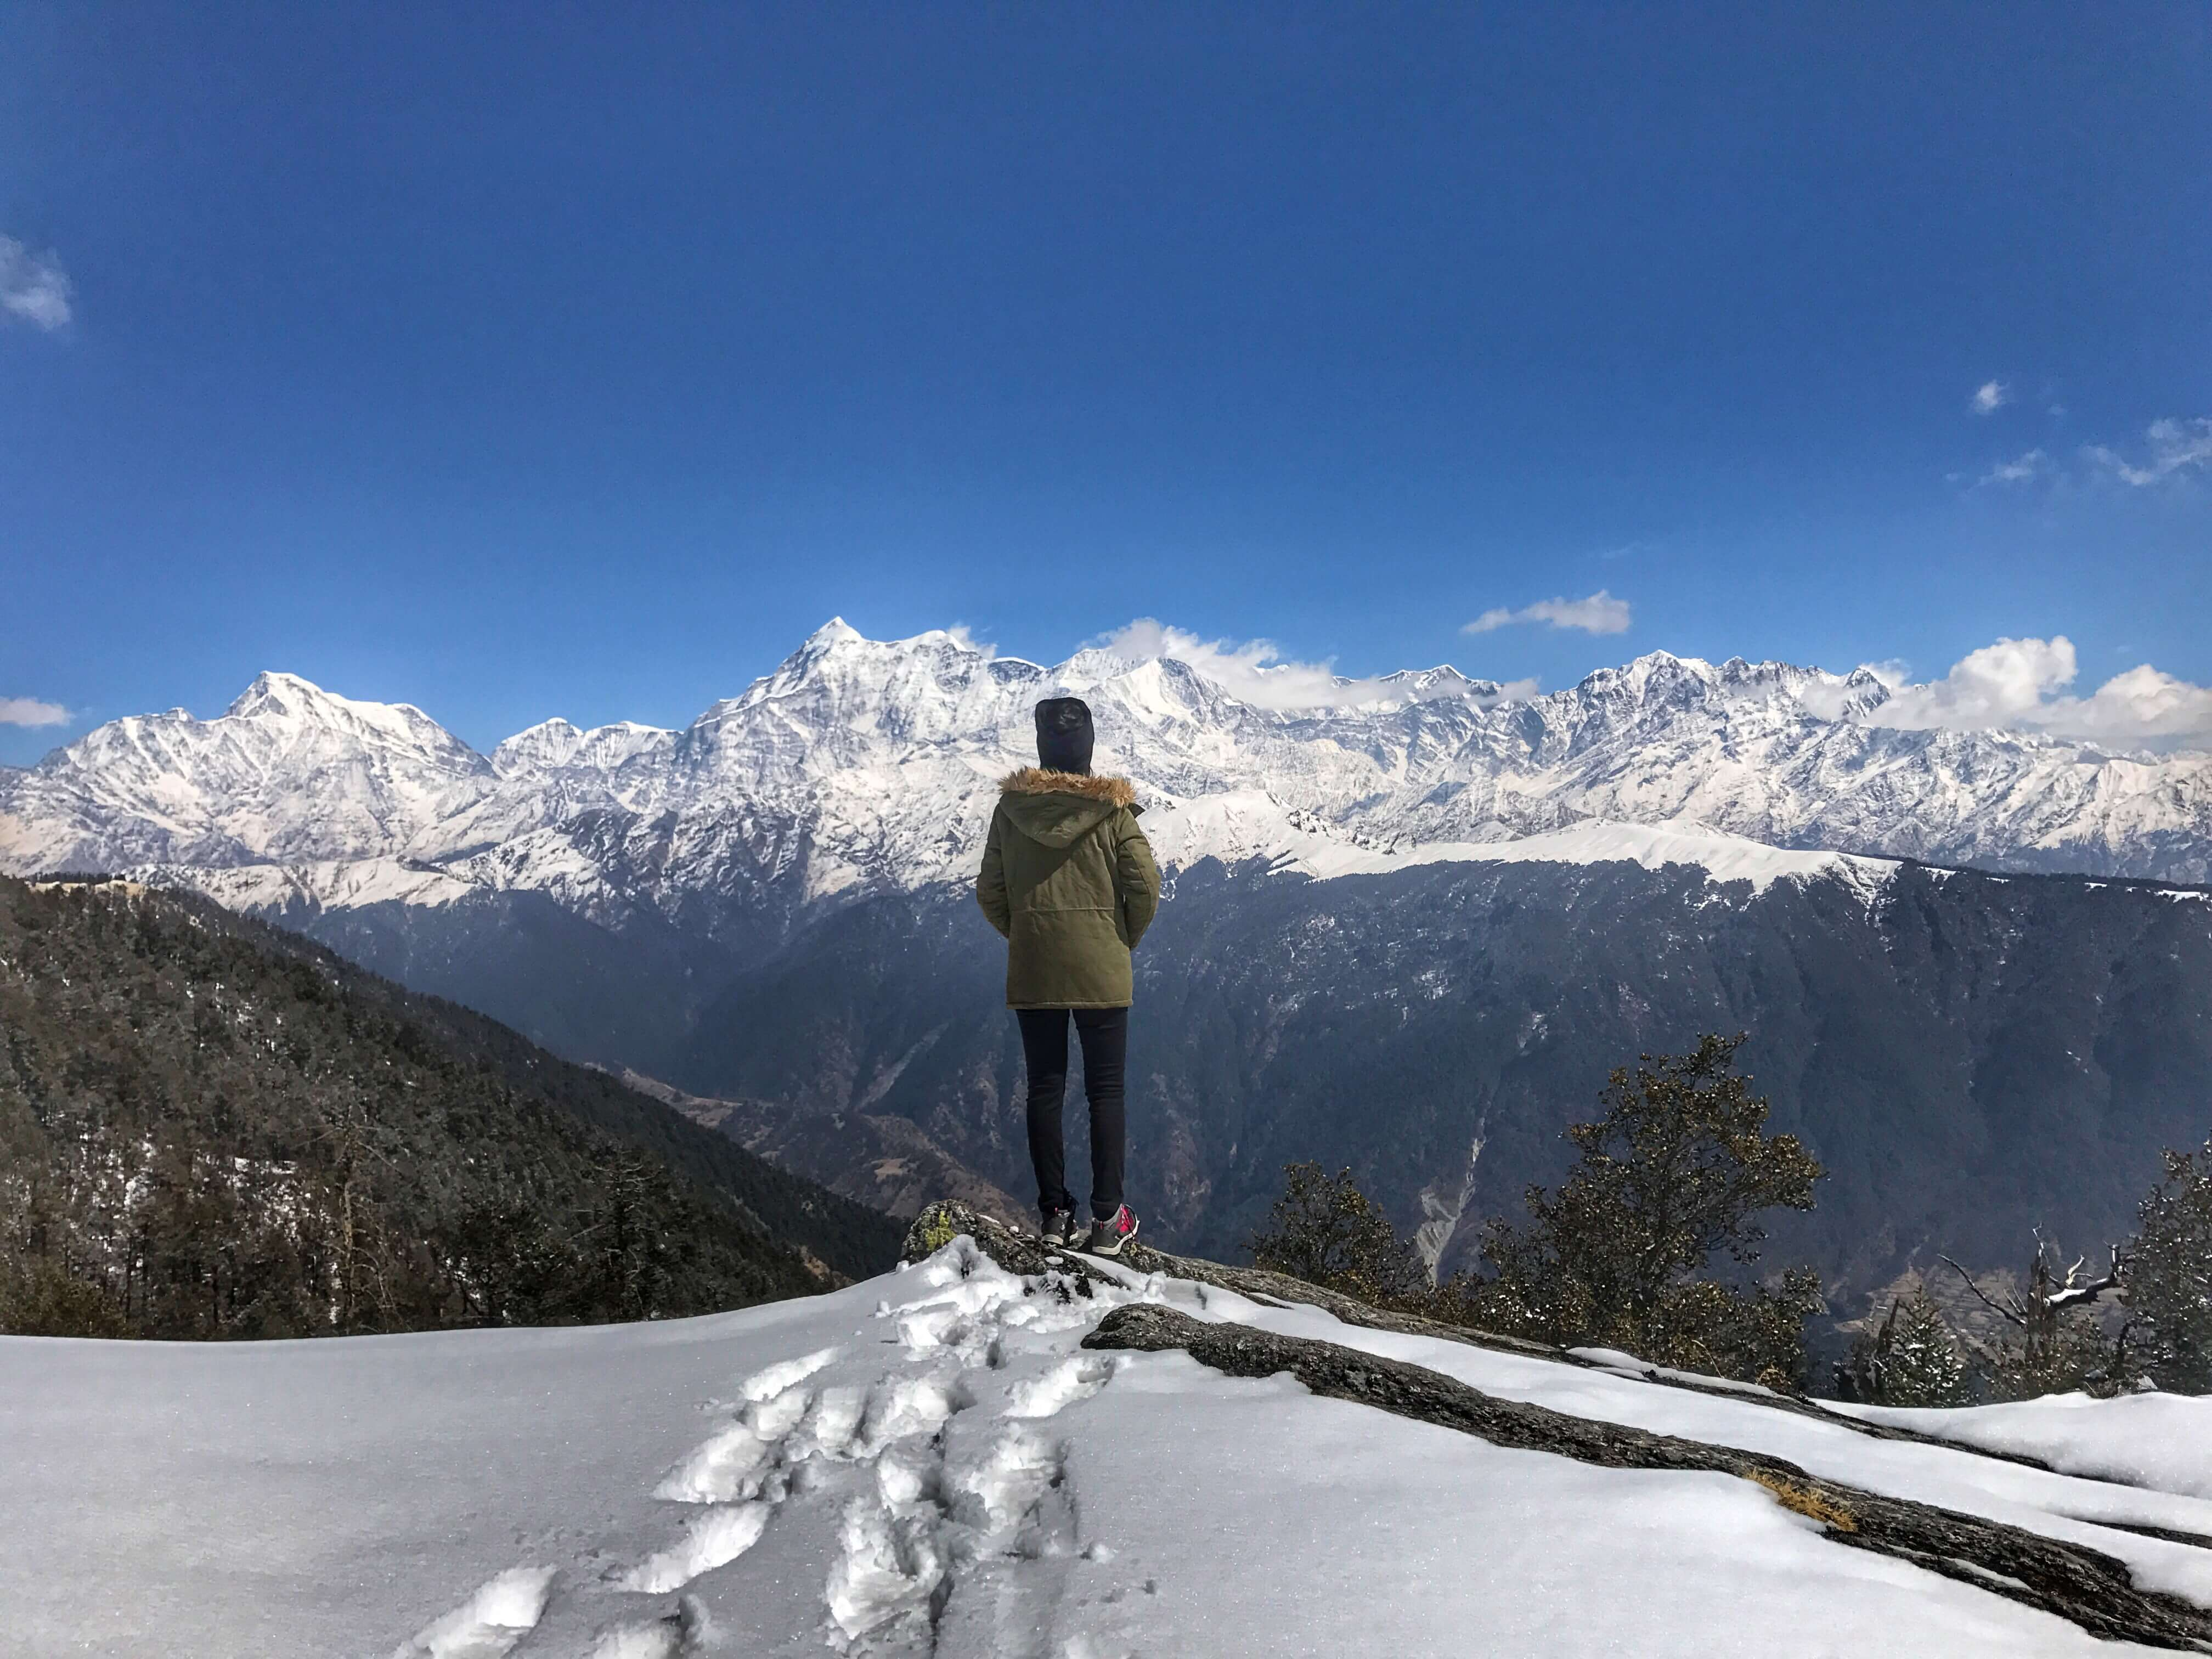 Brahmatal Winter Trek: A photo story from an amateur trekker